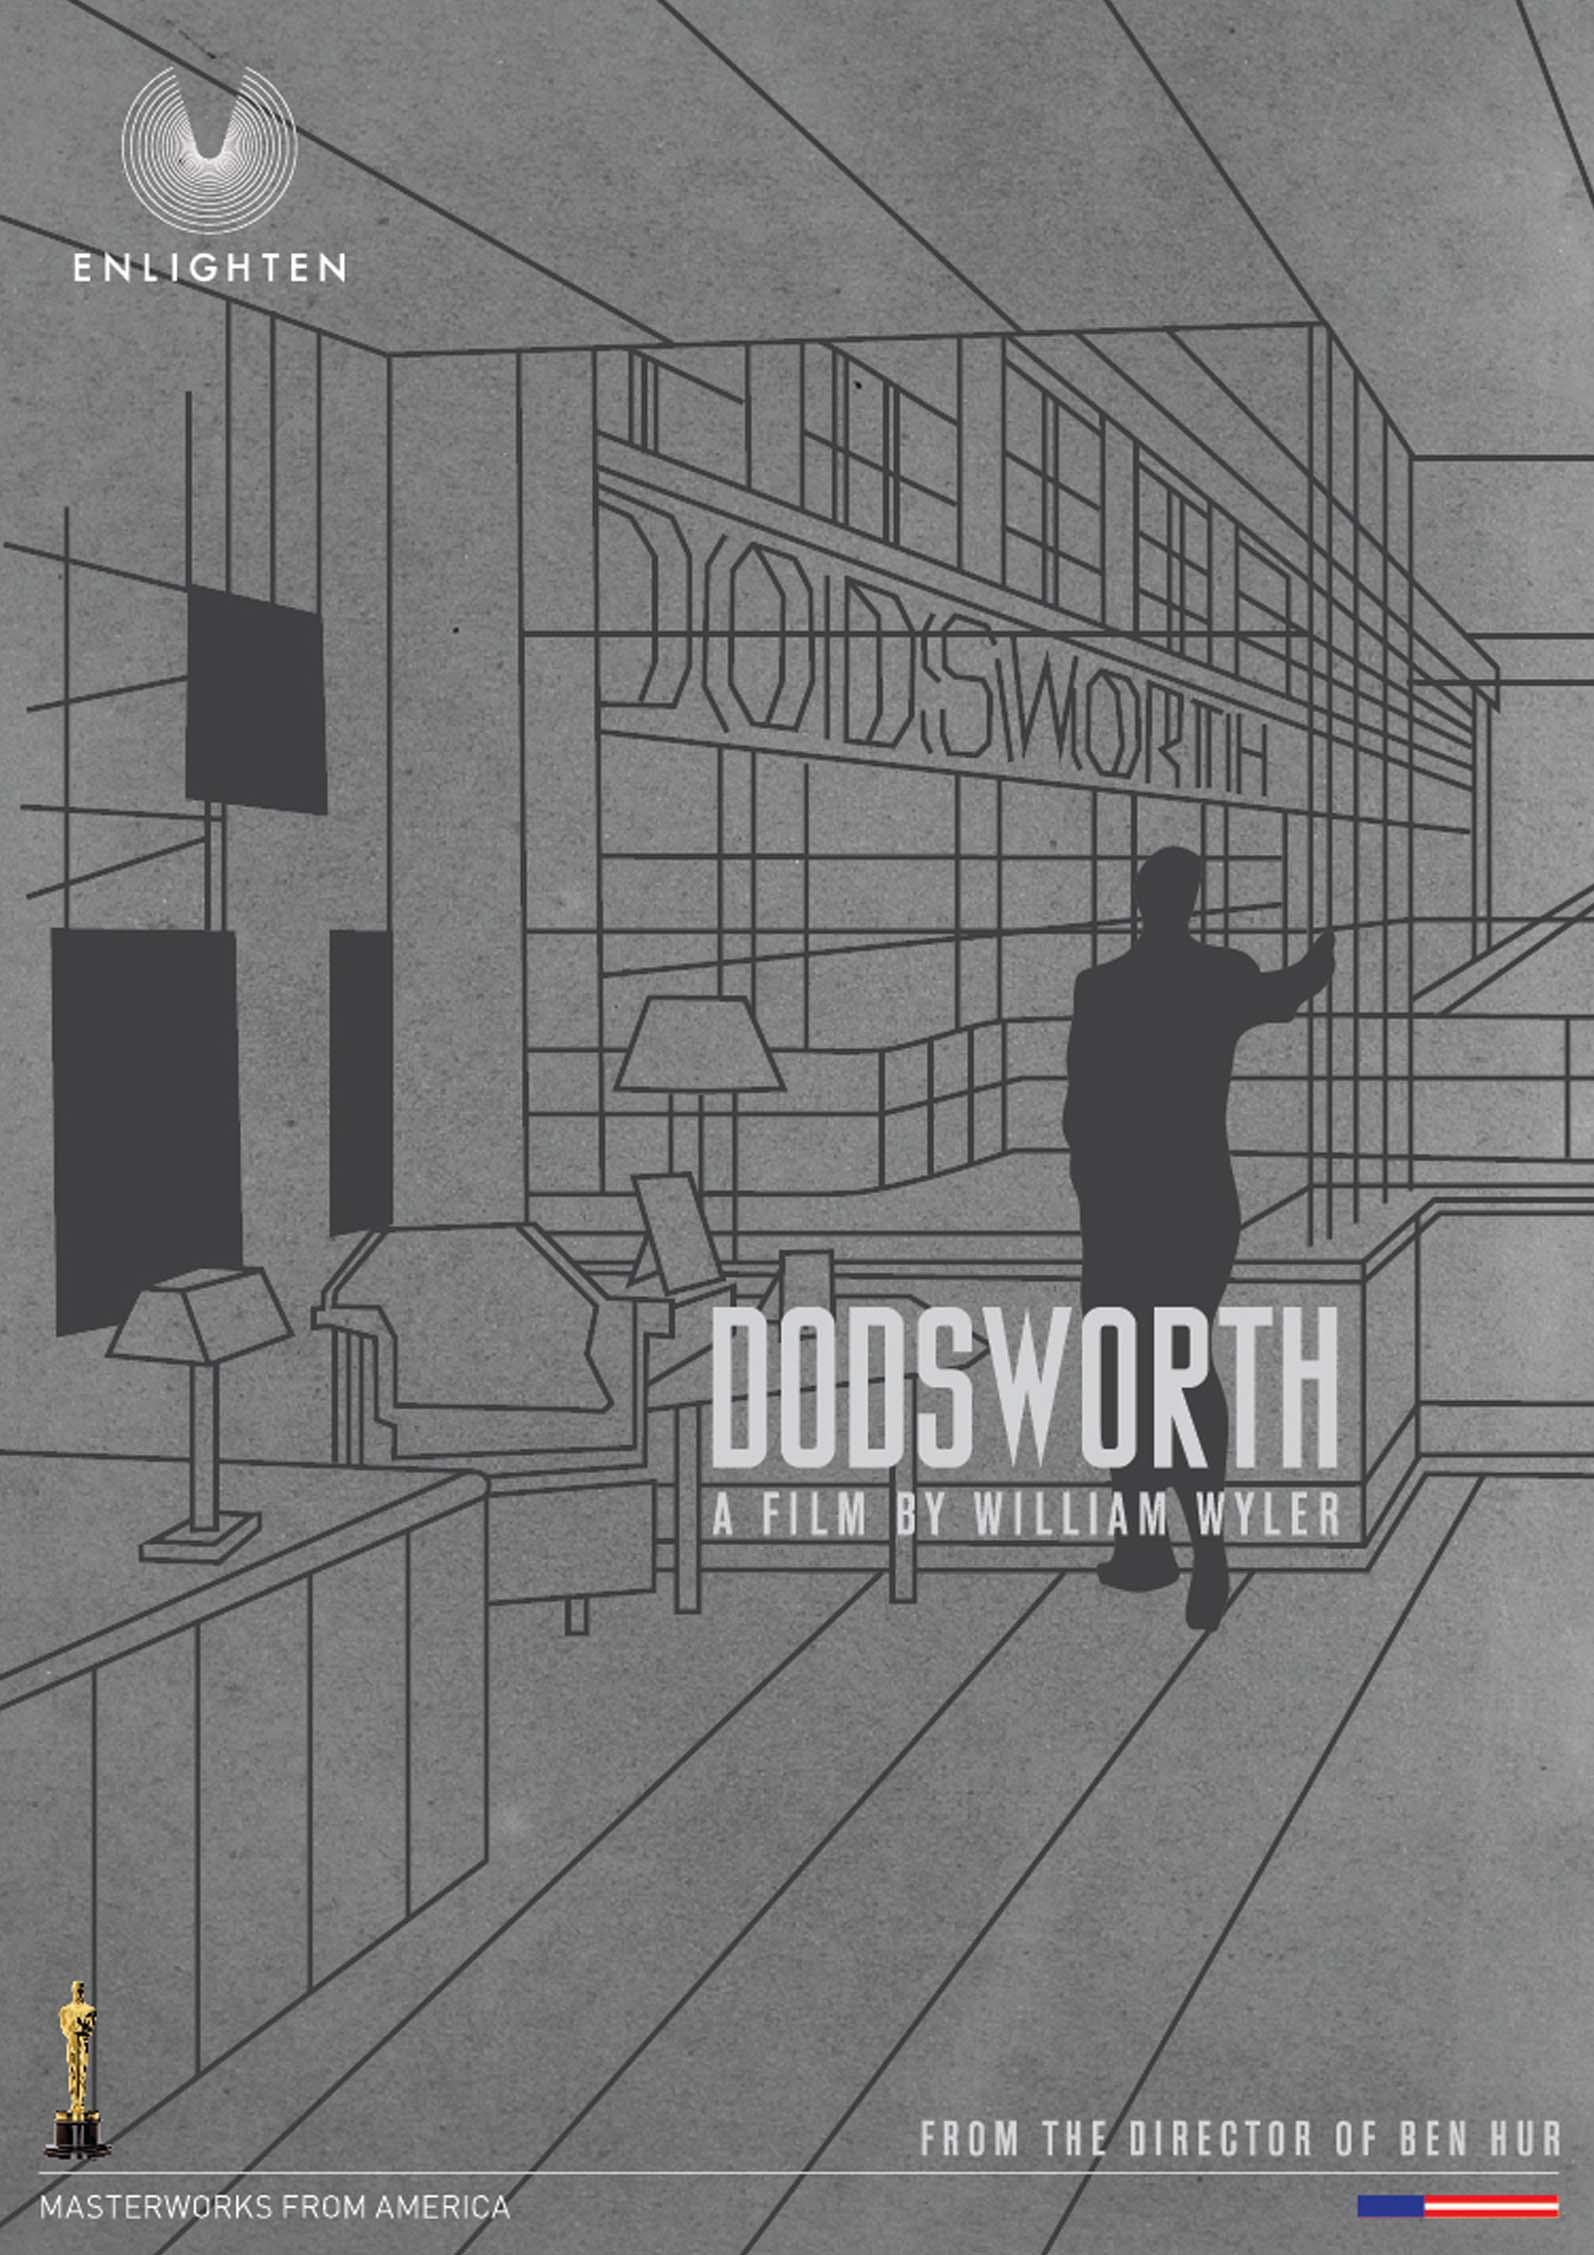 Dodsworth.jpg